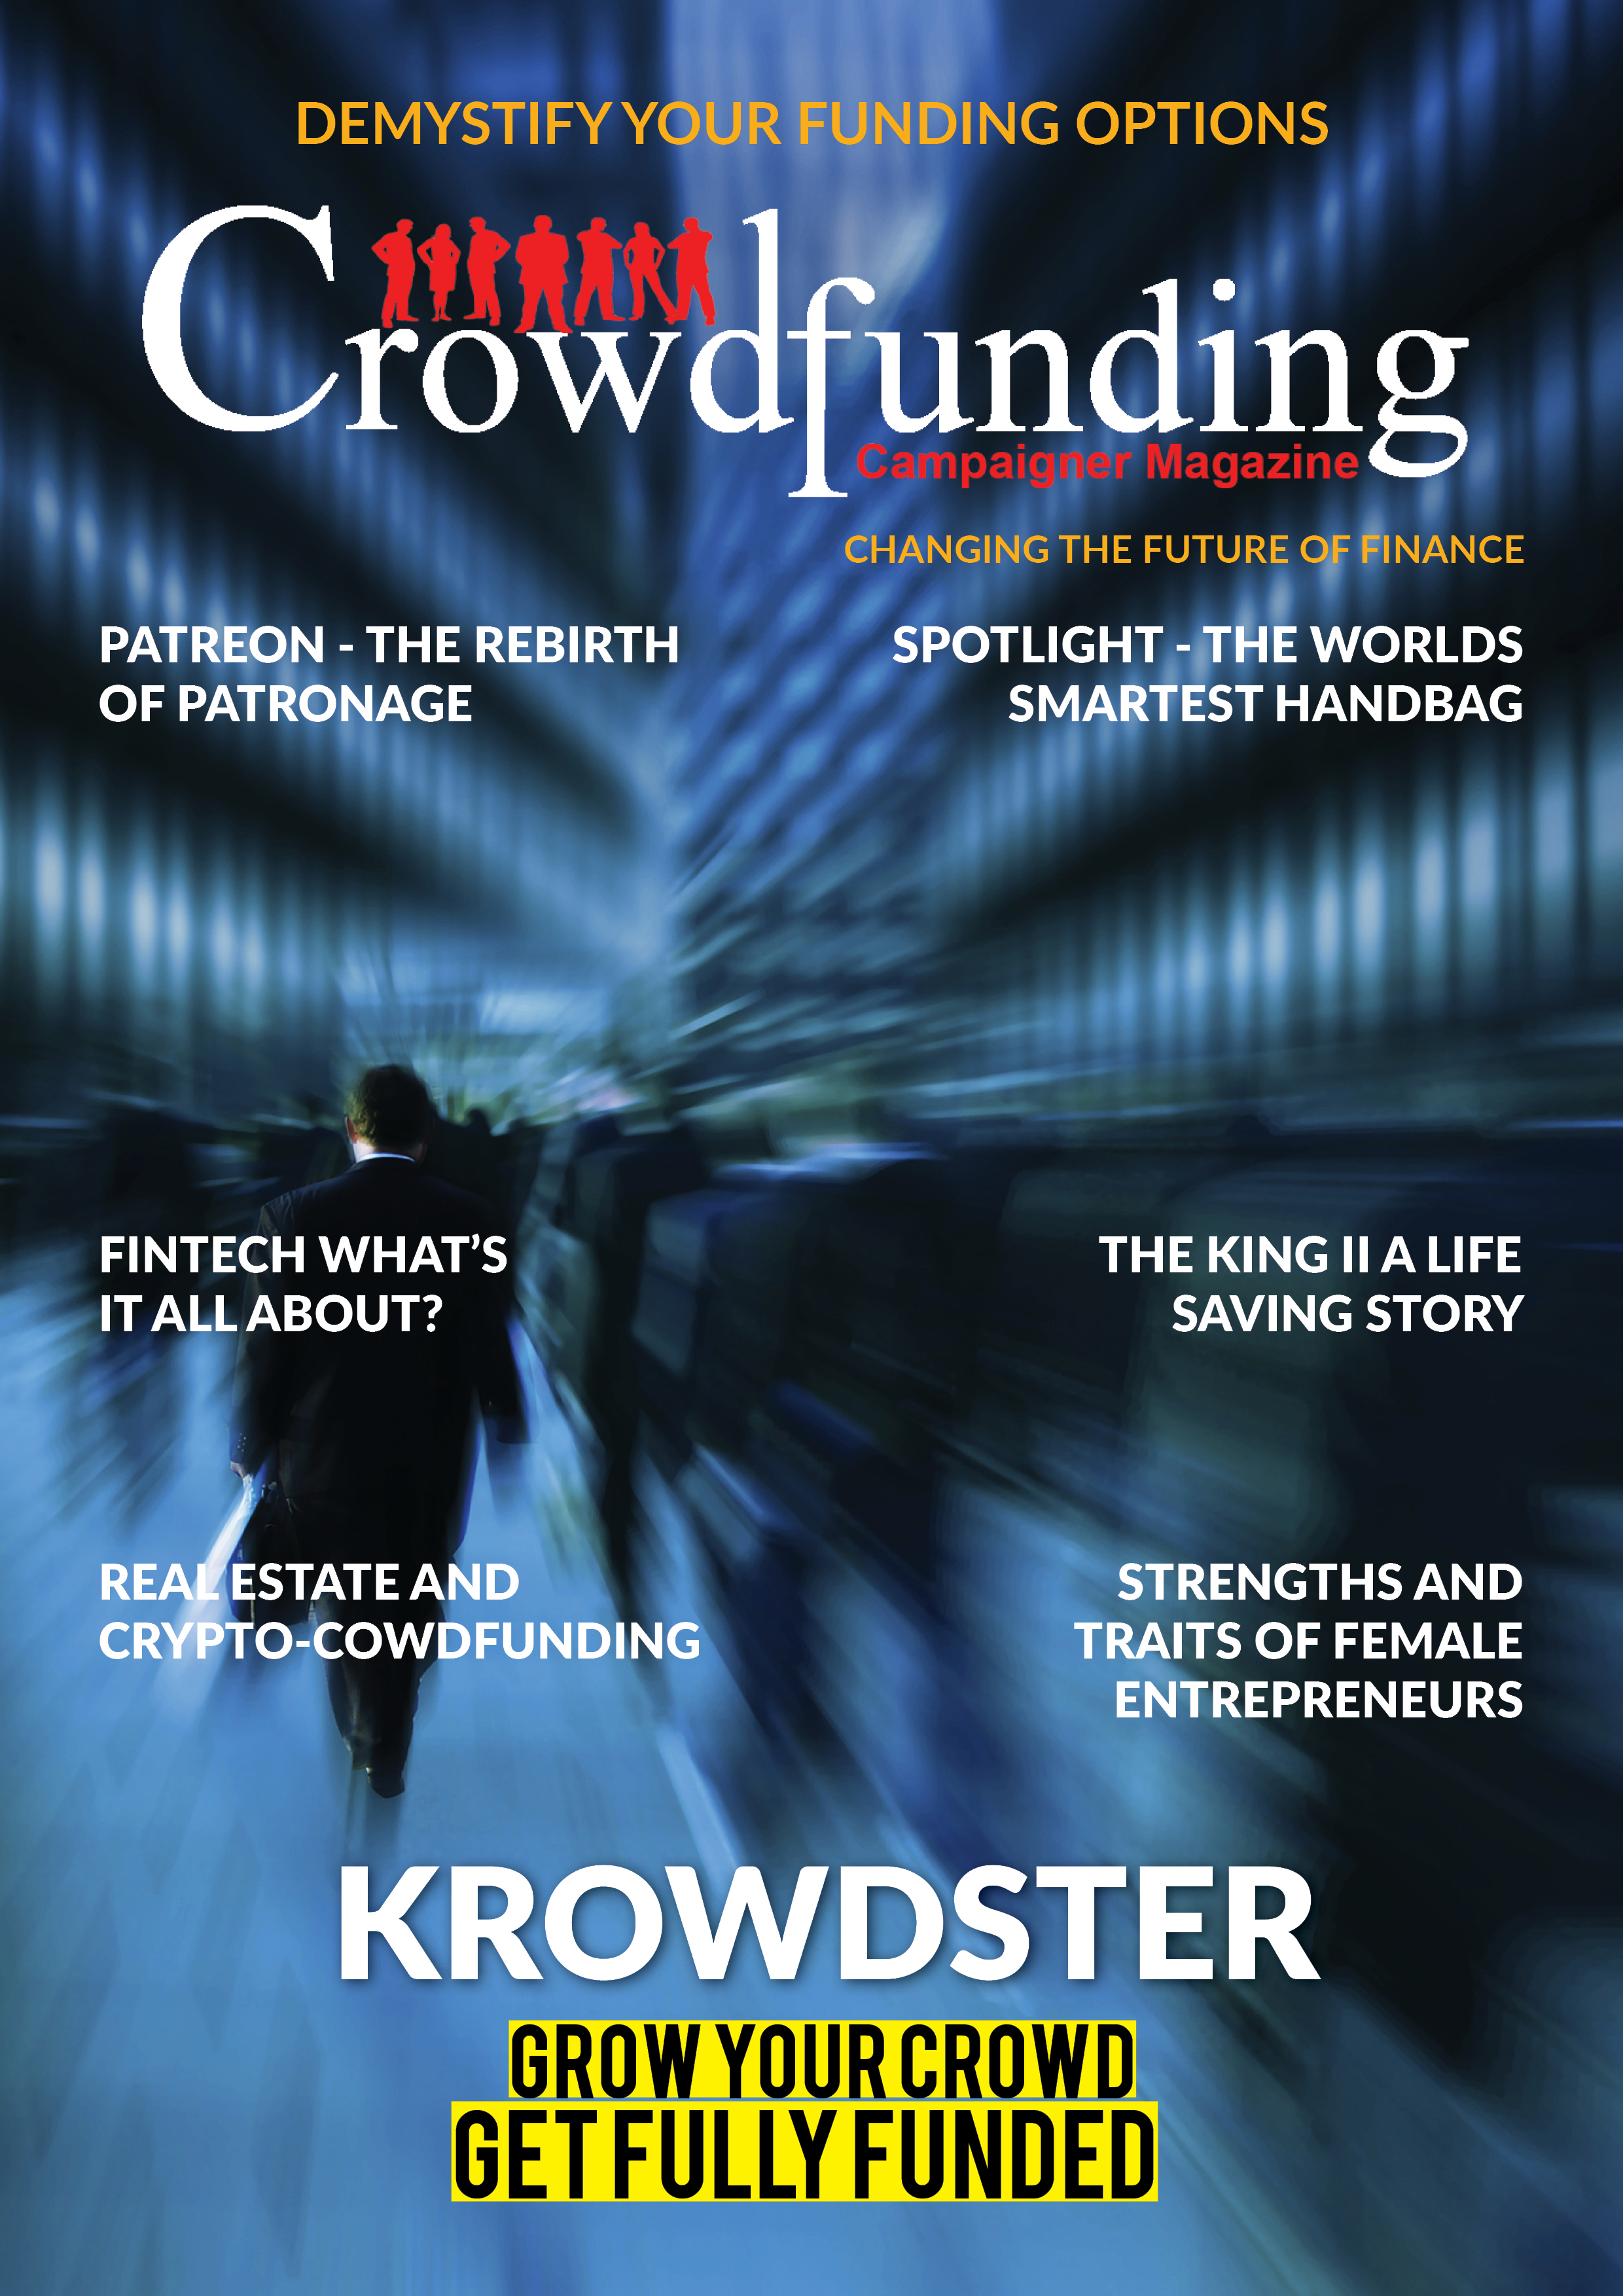 crowdfunding campaigner magazine